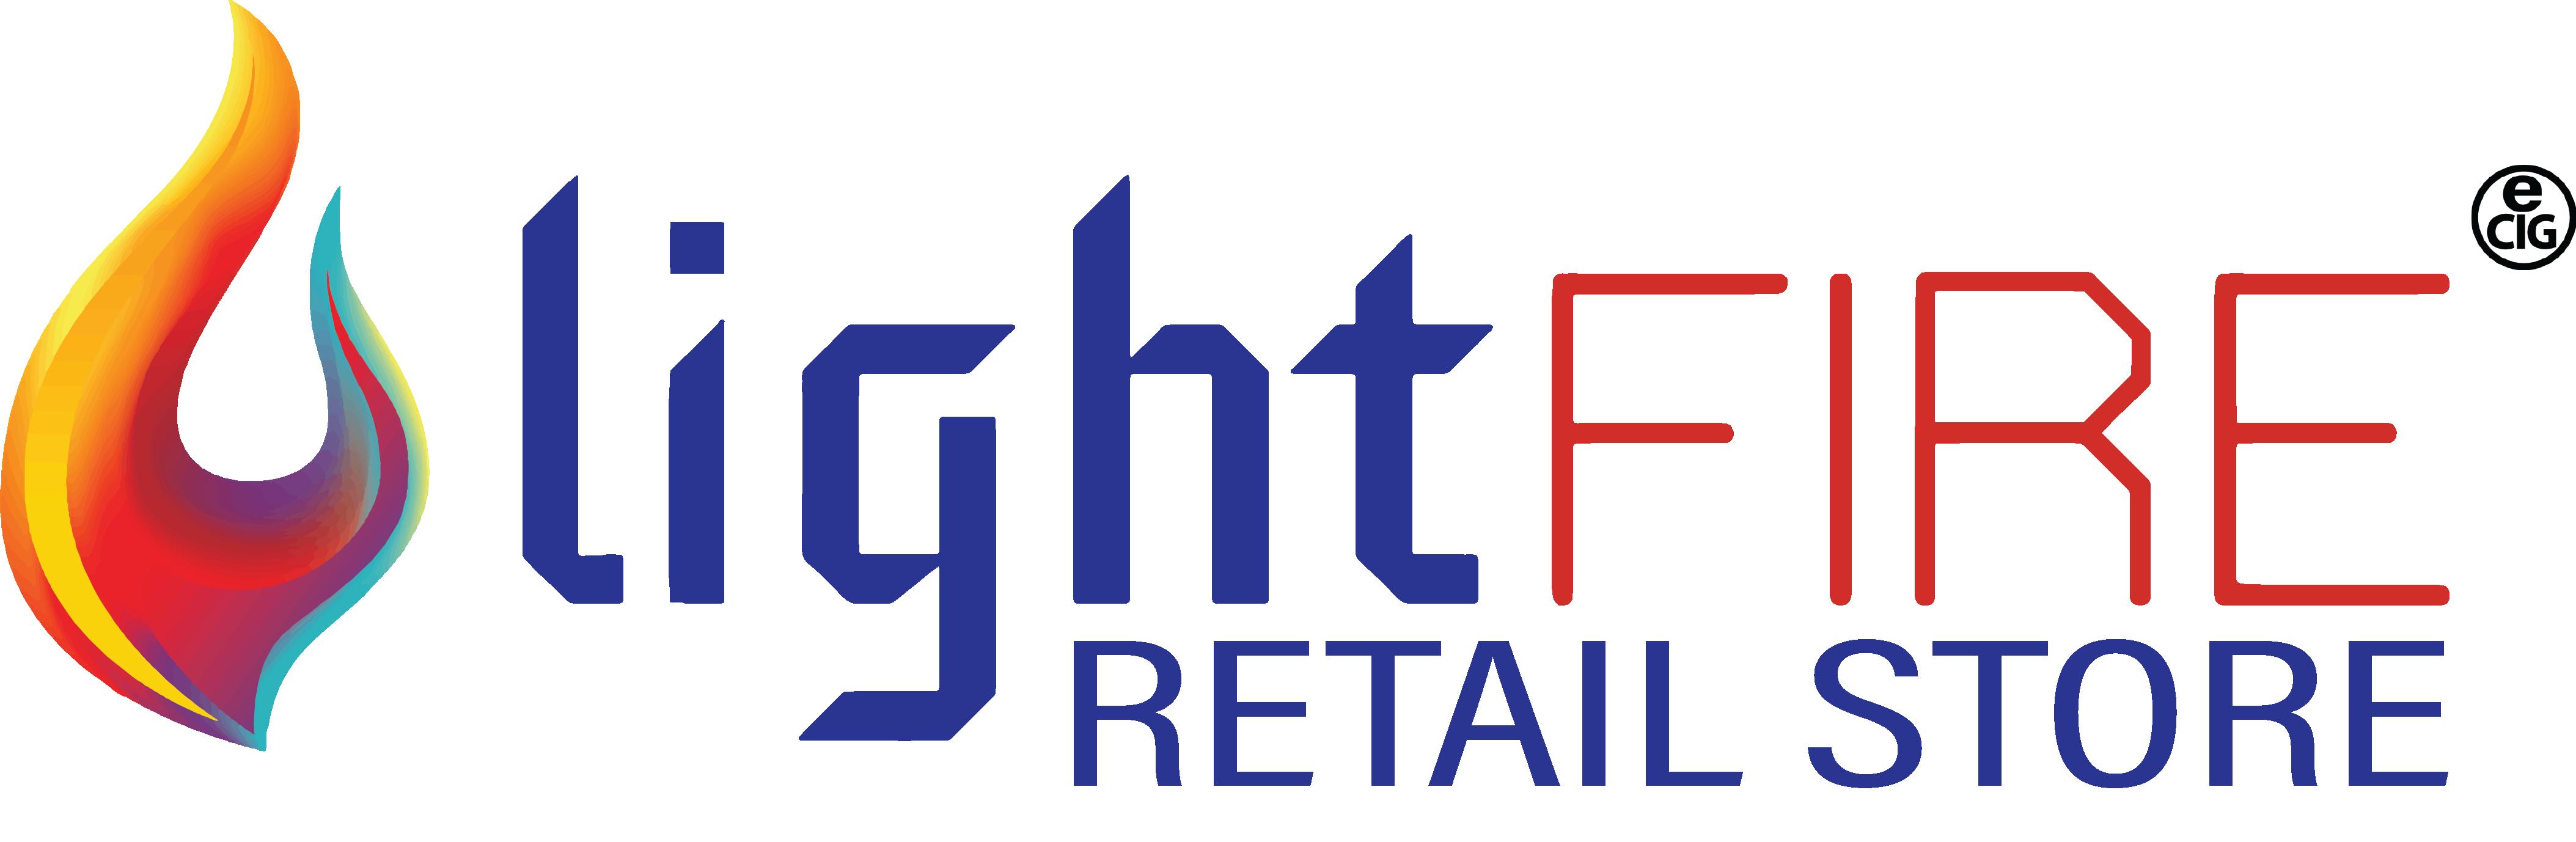 lf-vector-logo-reatil-store.png